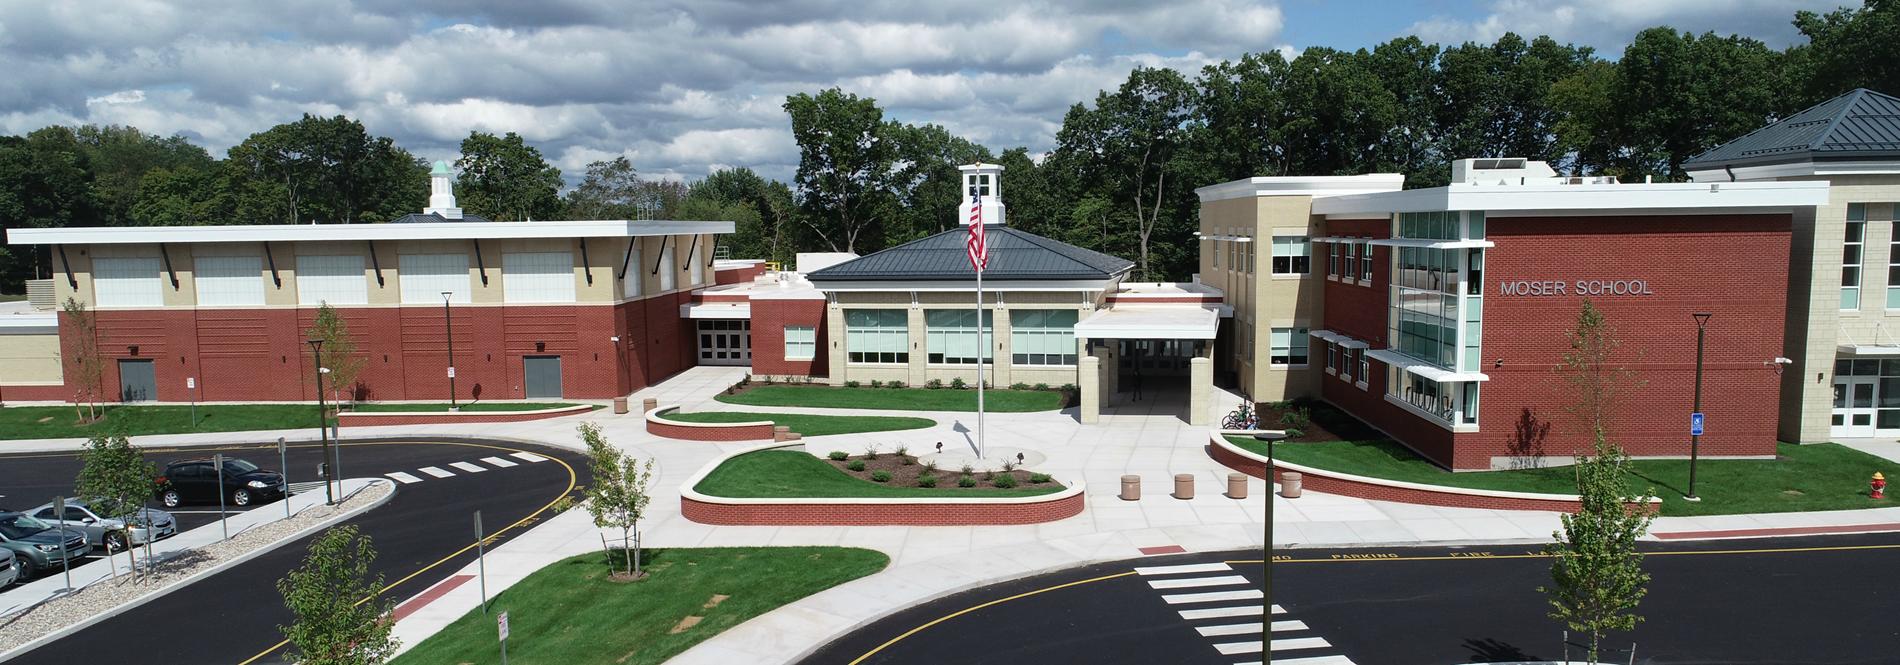 Moser School Front Entrance